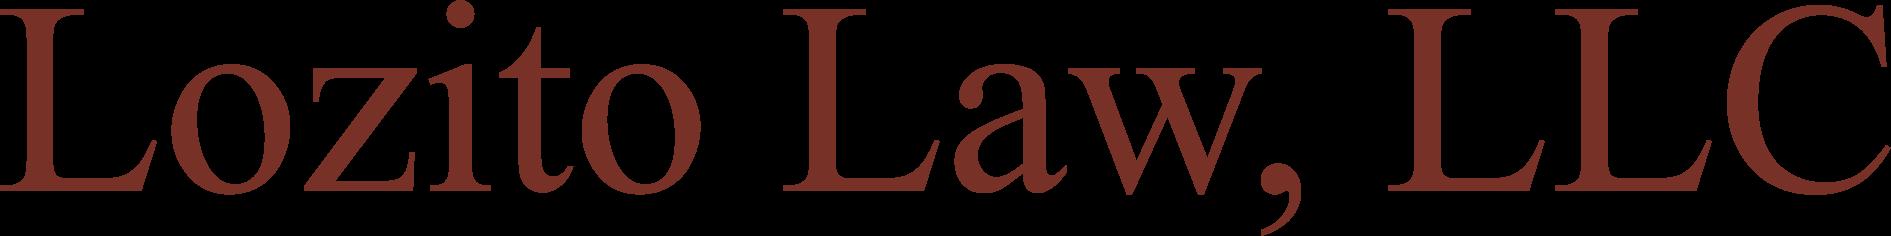 Lozito Law, LLC – Wordmark